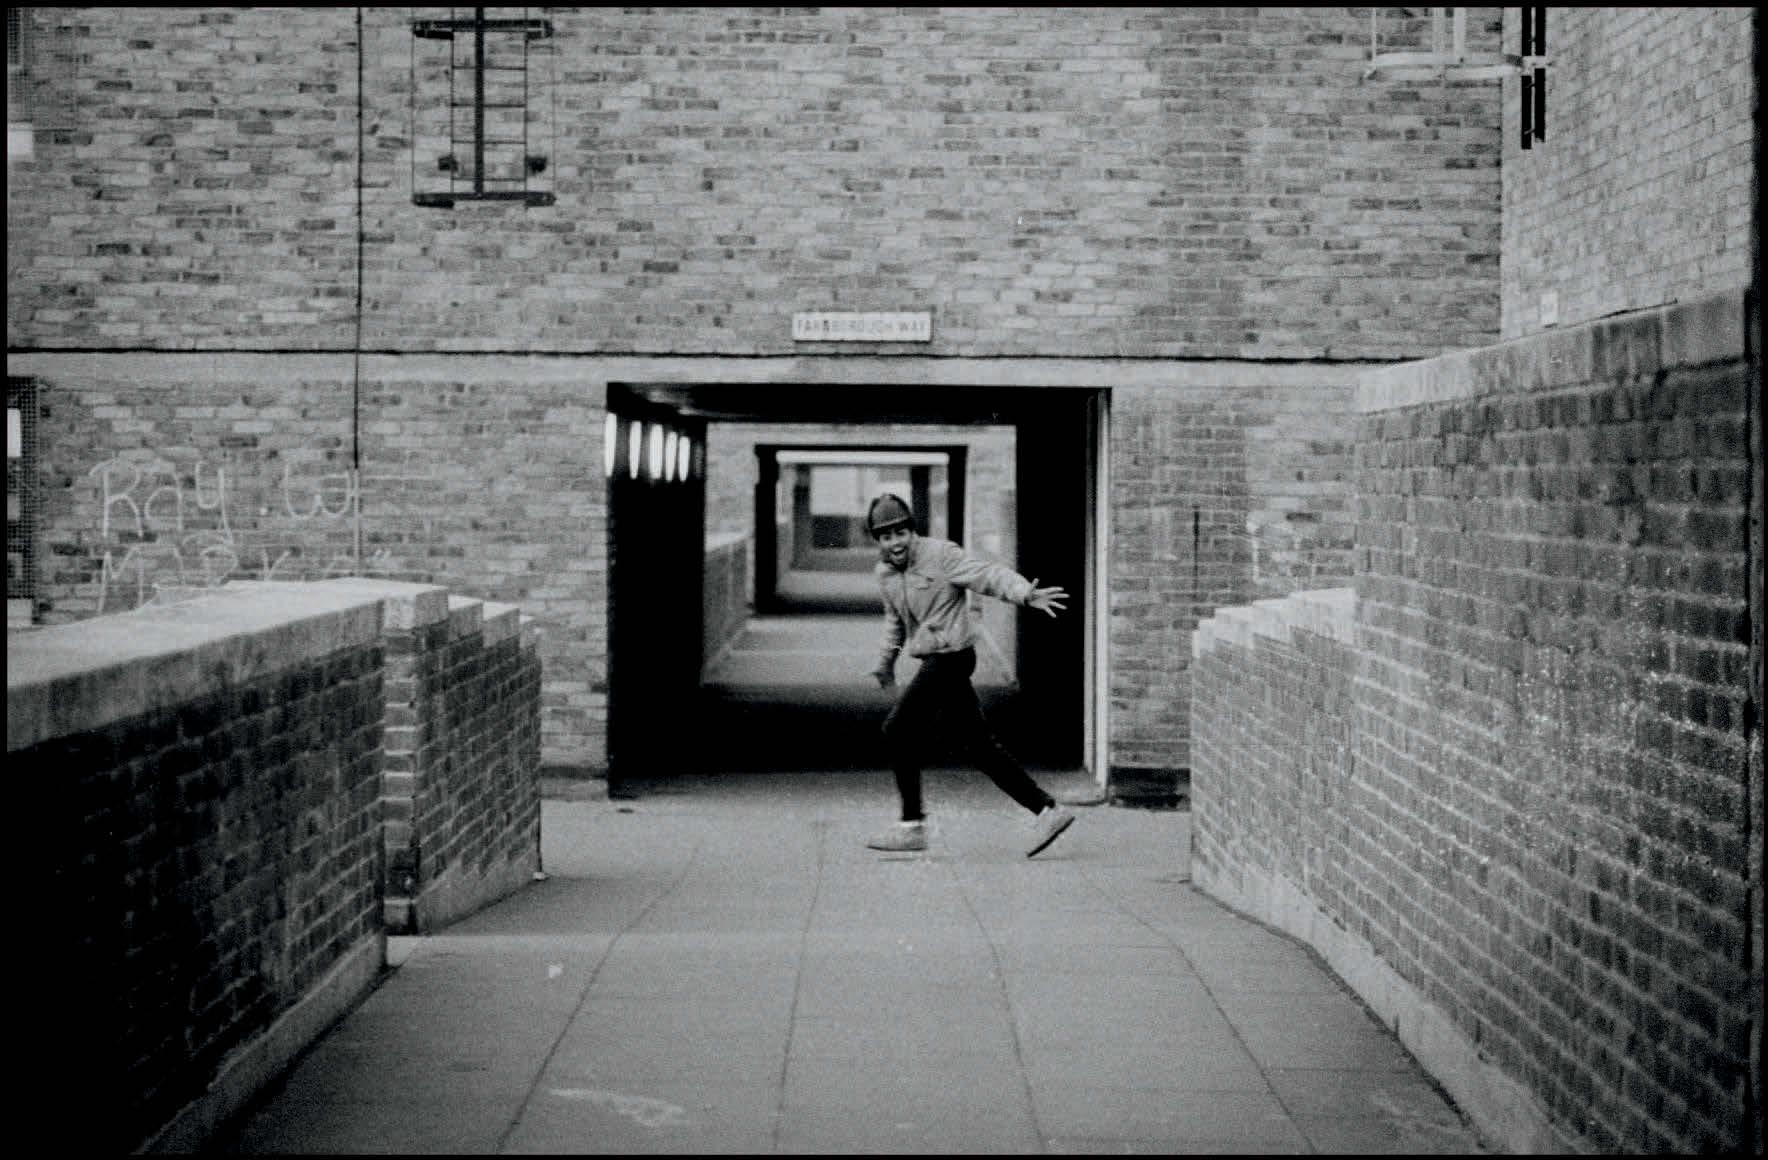 martin-north-peckham-estate-london-1984.jpg